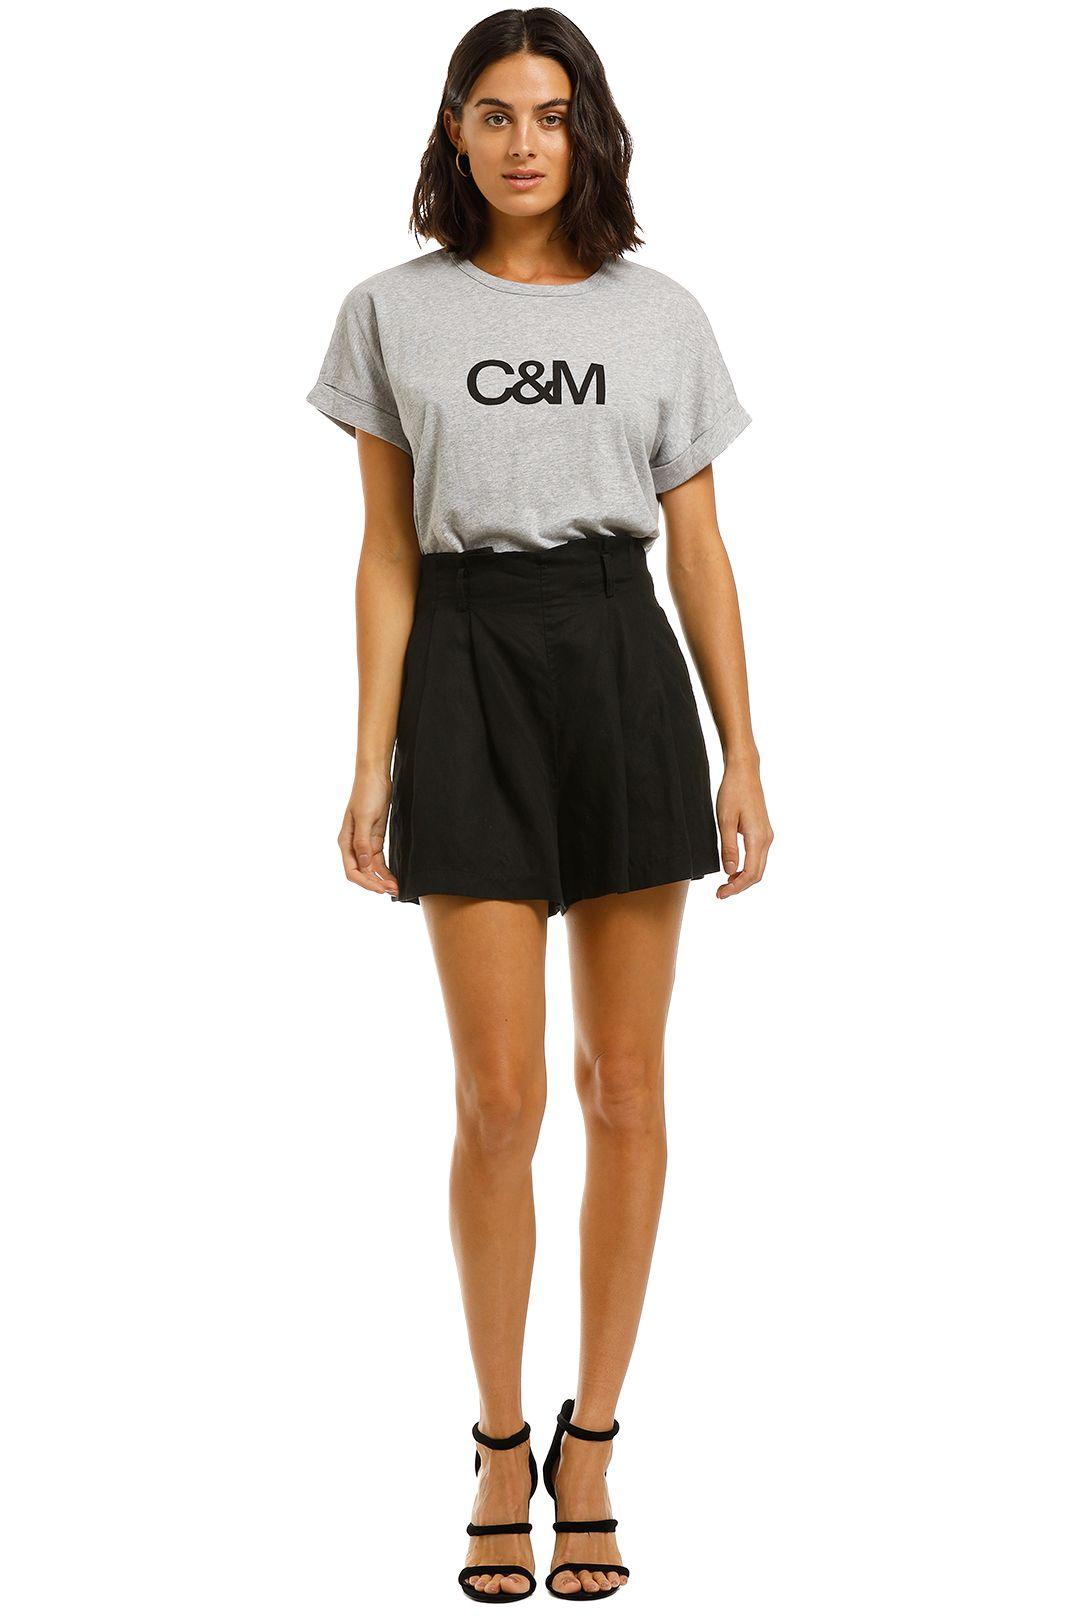 C&M-Camilla-And-Marc-Huntington-Logo-Tee-Grey-Front